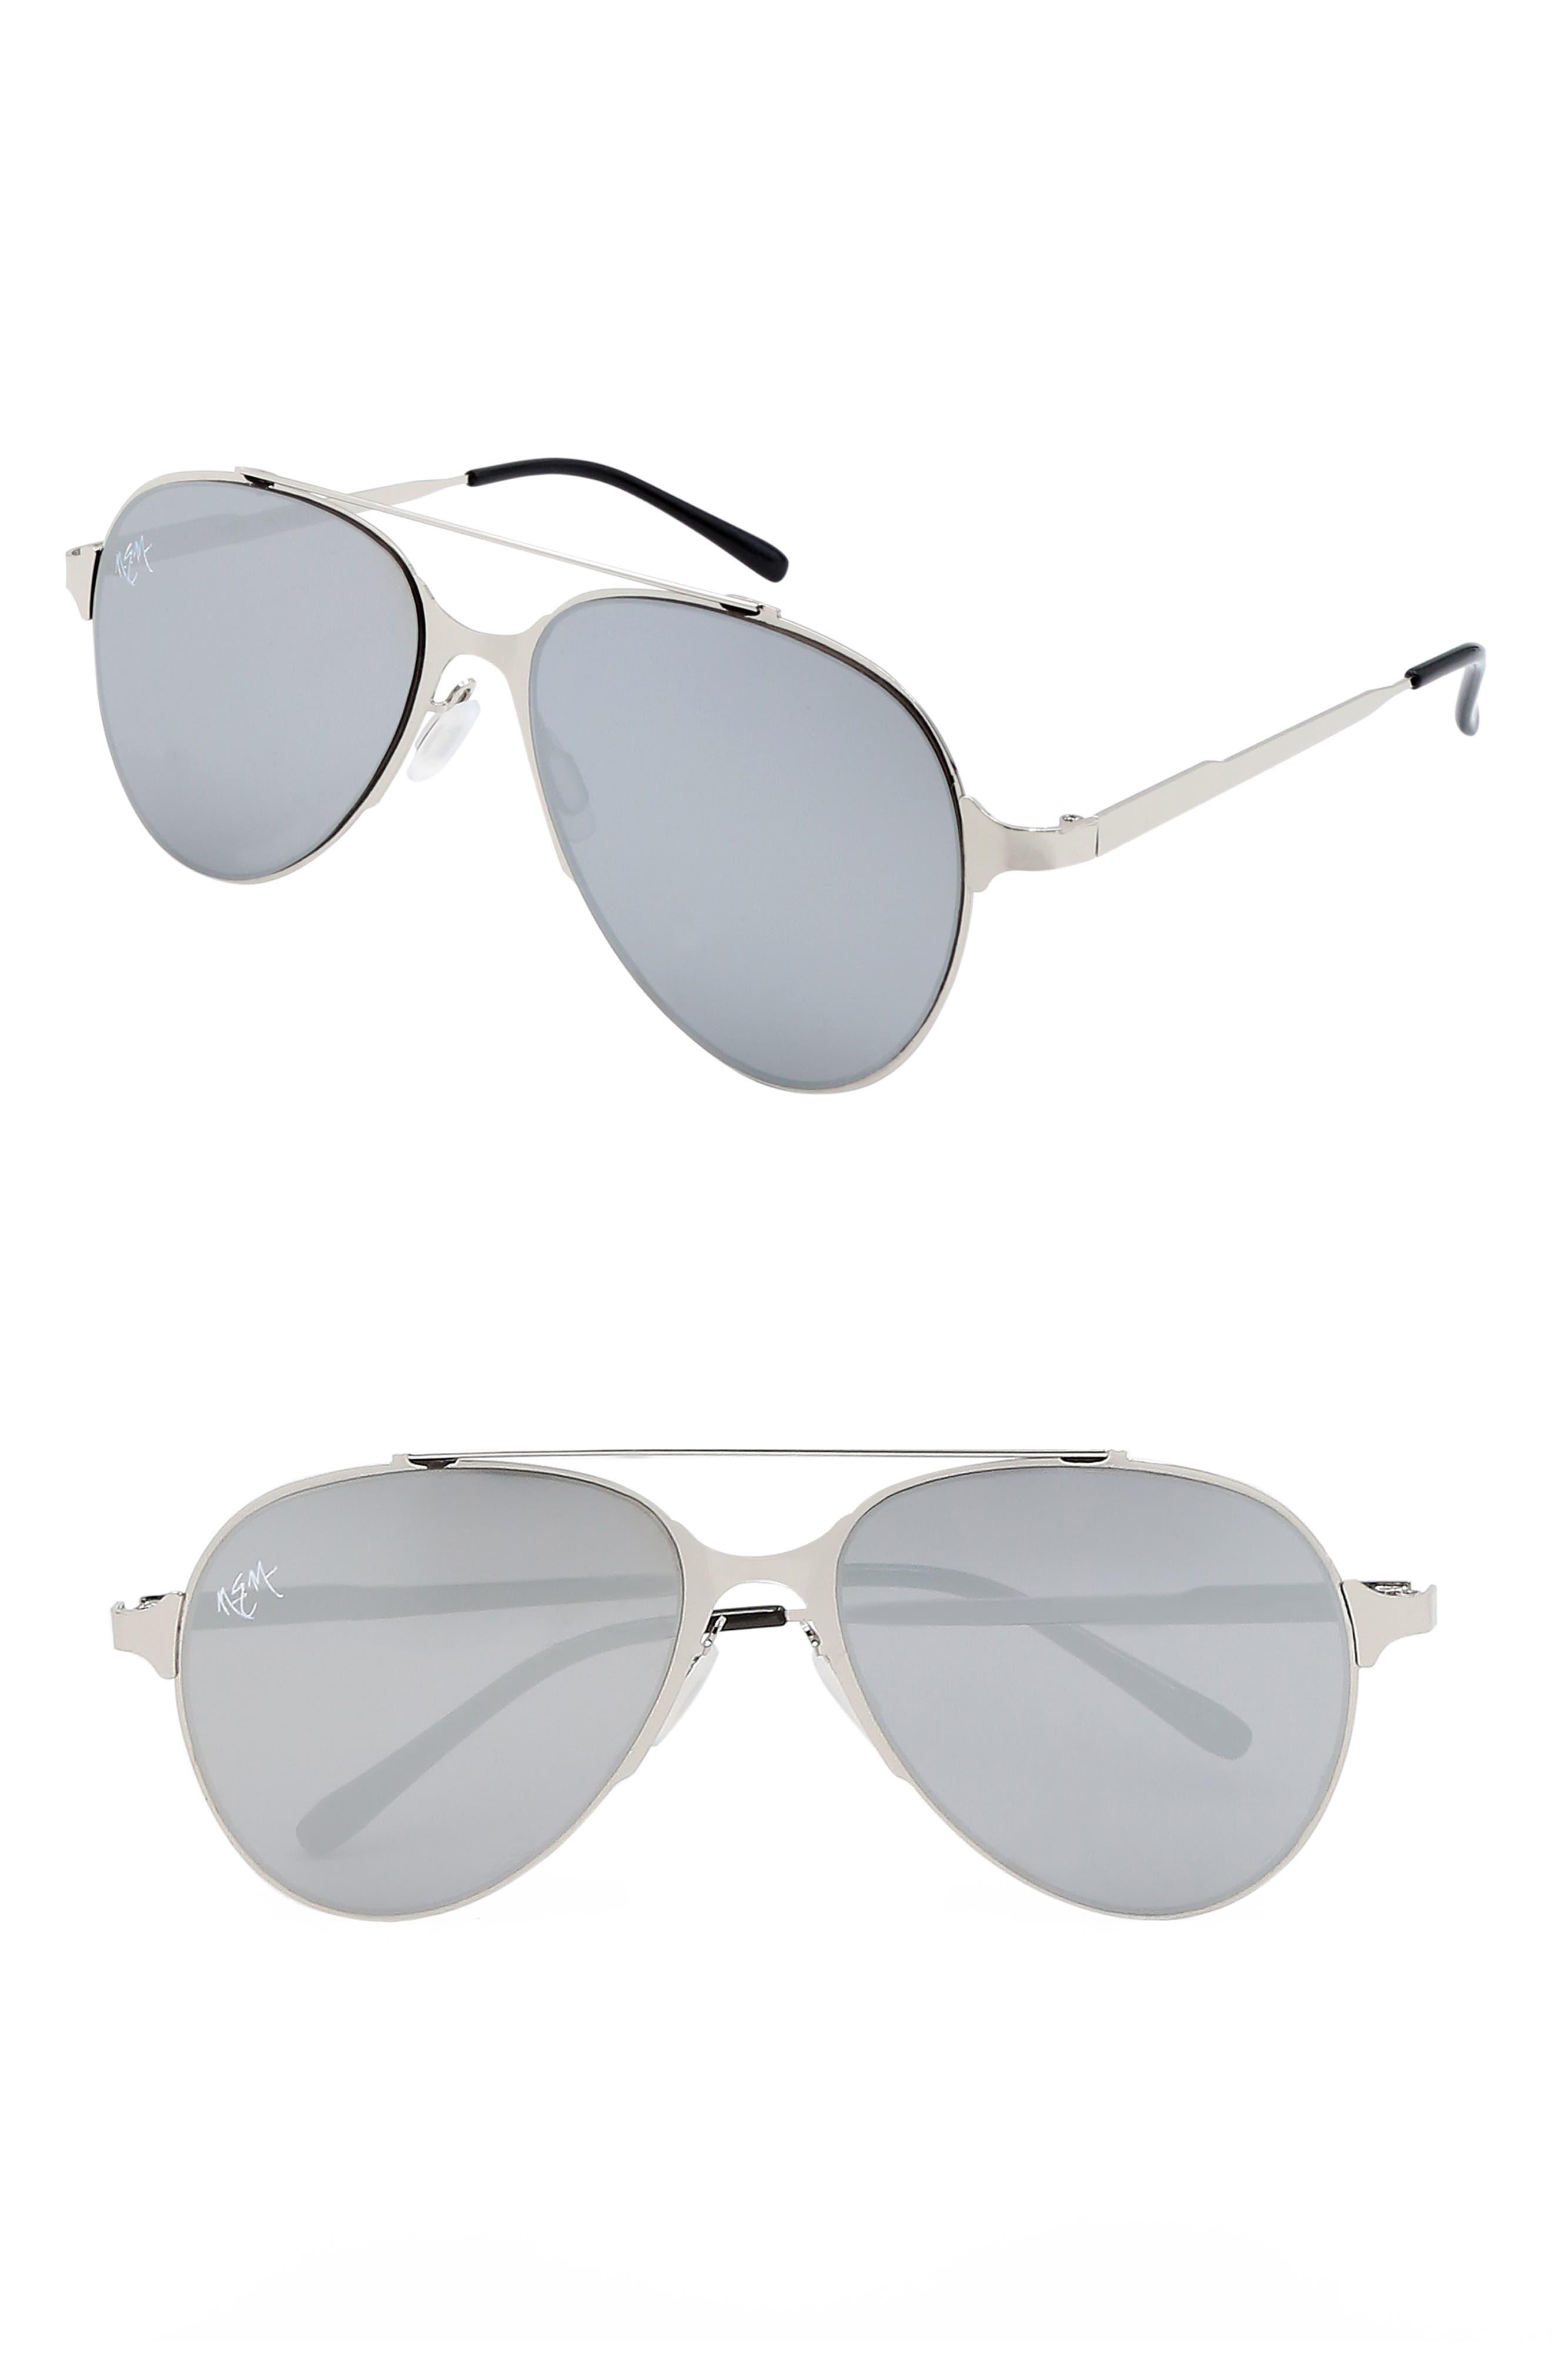 Nem 55Mm Mirrored Aviator Sunglasses - Silver W Mirror Lens